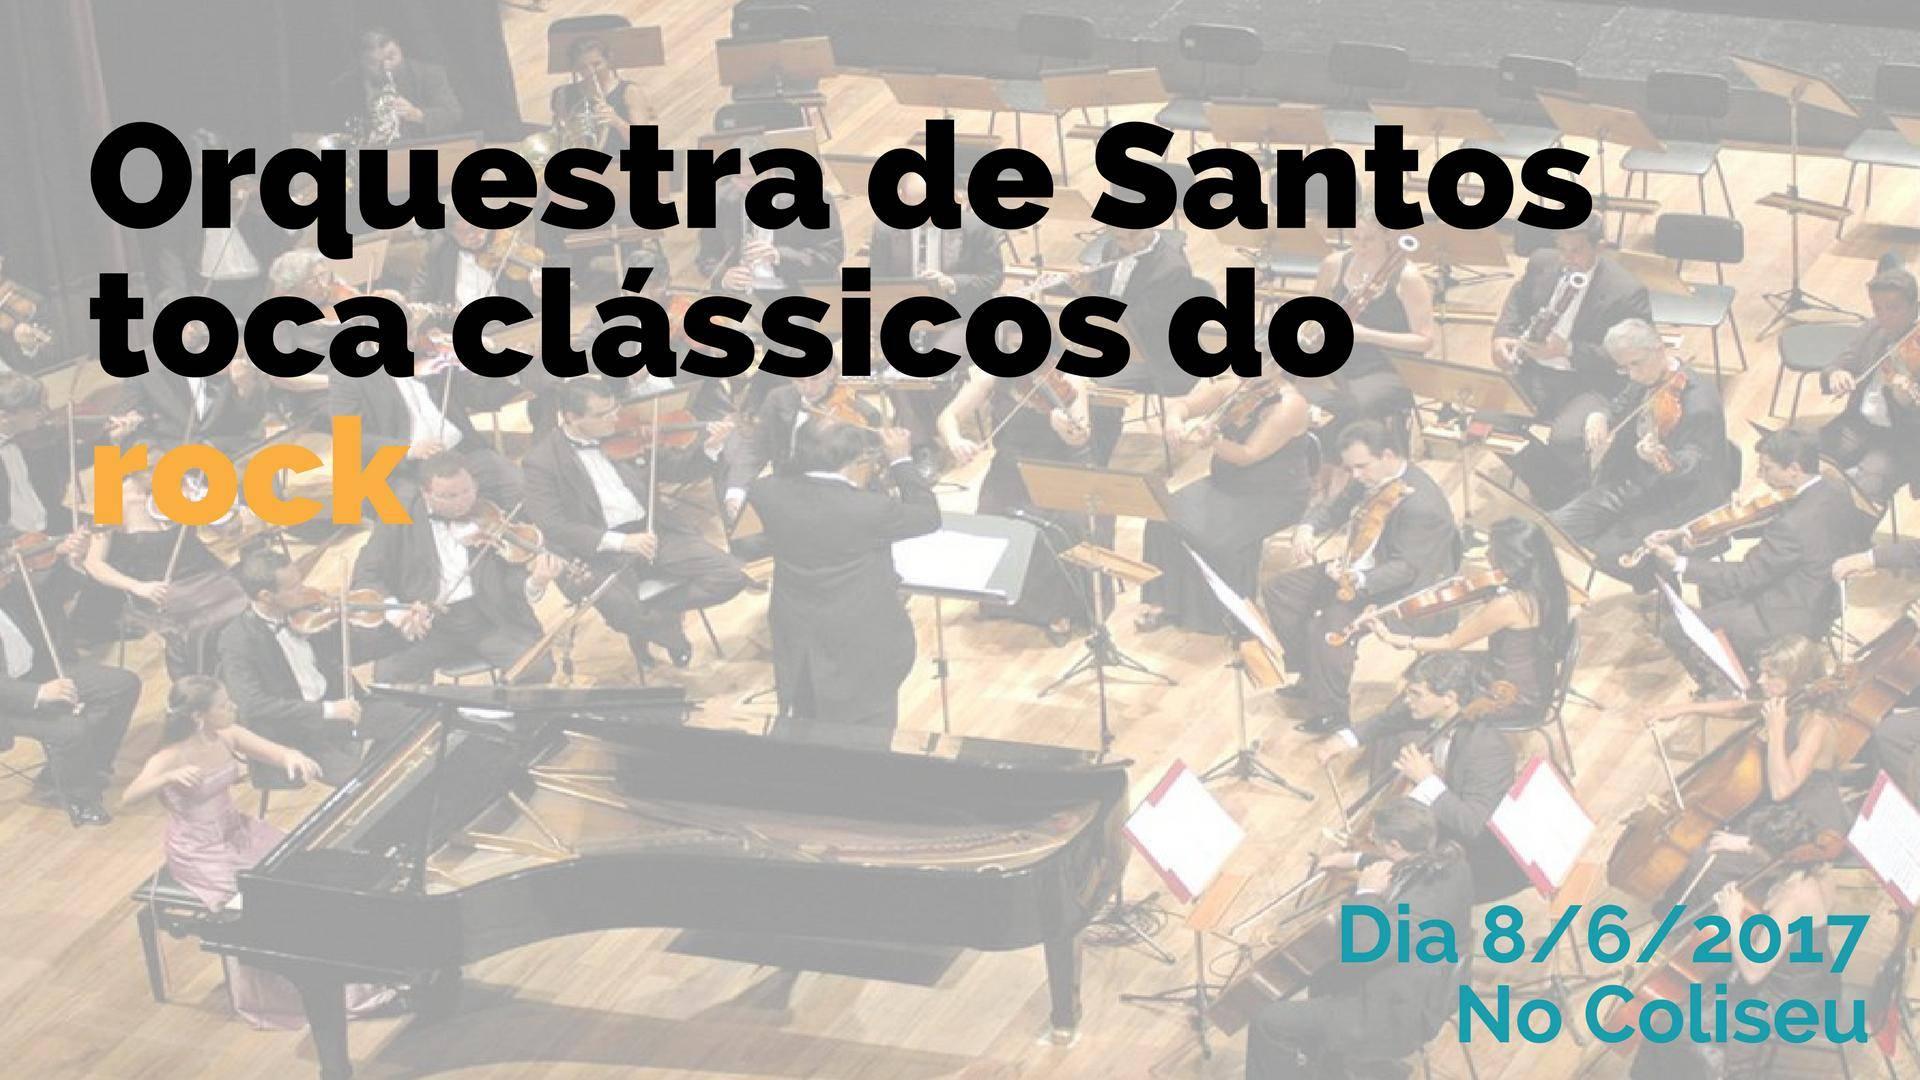 www.juicysantos.com.br - orquestra de santos toca clássicos do rock no coliseu